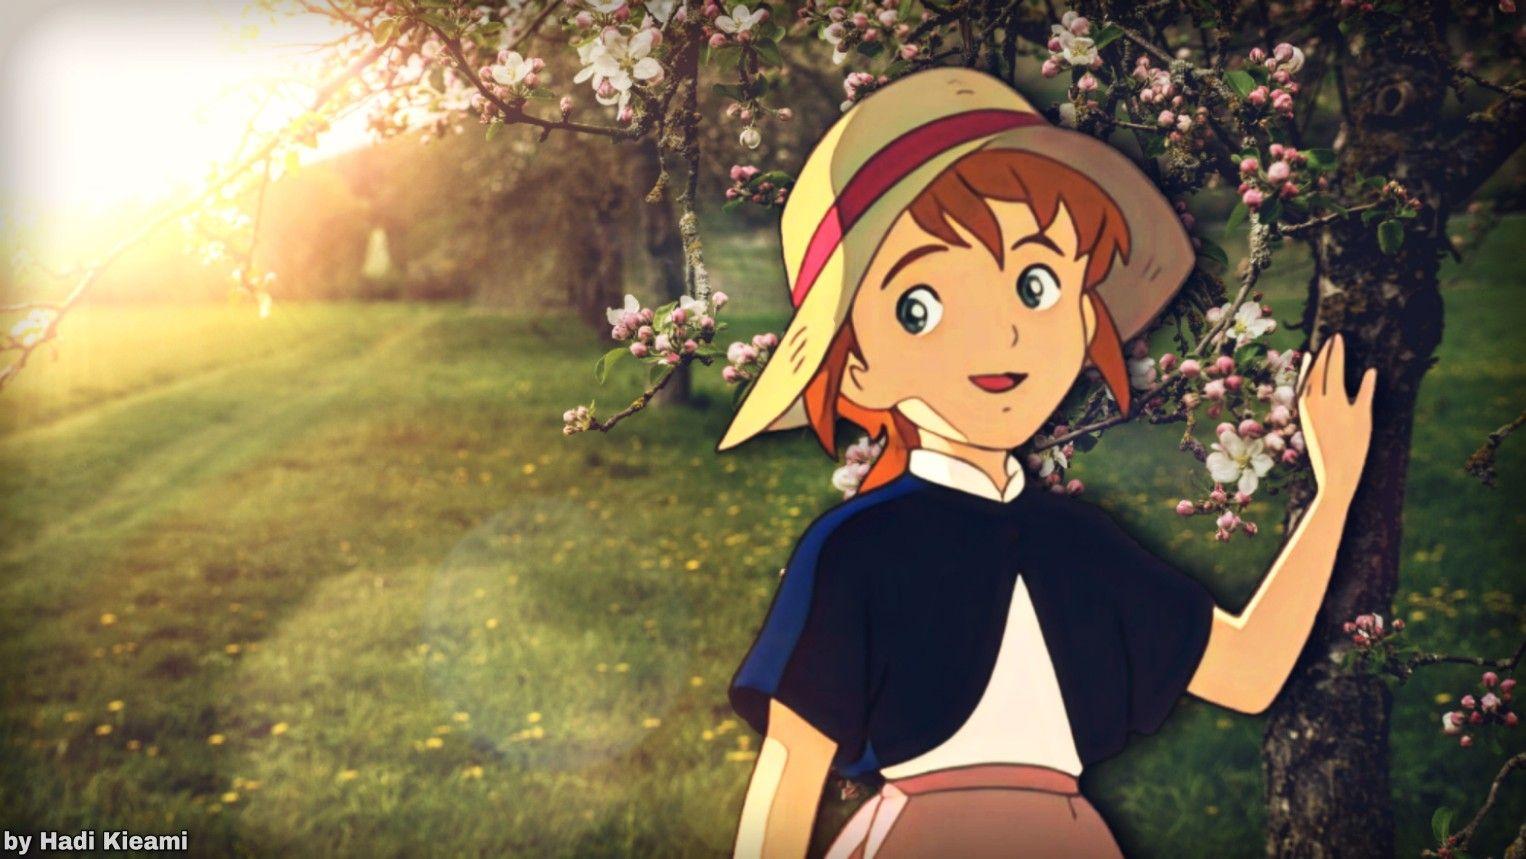 Remi From Remi Nobody S Girl دروب ريمي تصميم Anime Wallpaper Hd خلفيات انمي عالية الدقة Anime Princess Old Anime Rose Gold Wallpaper